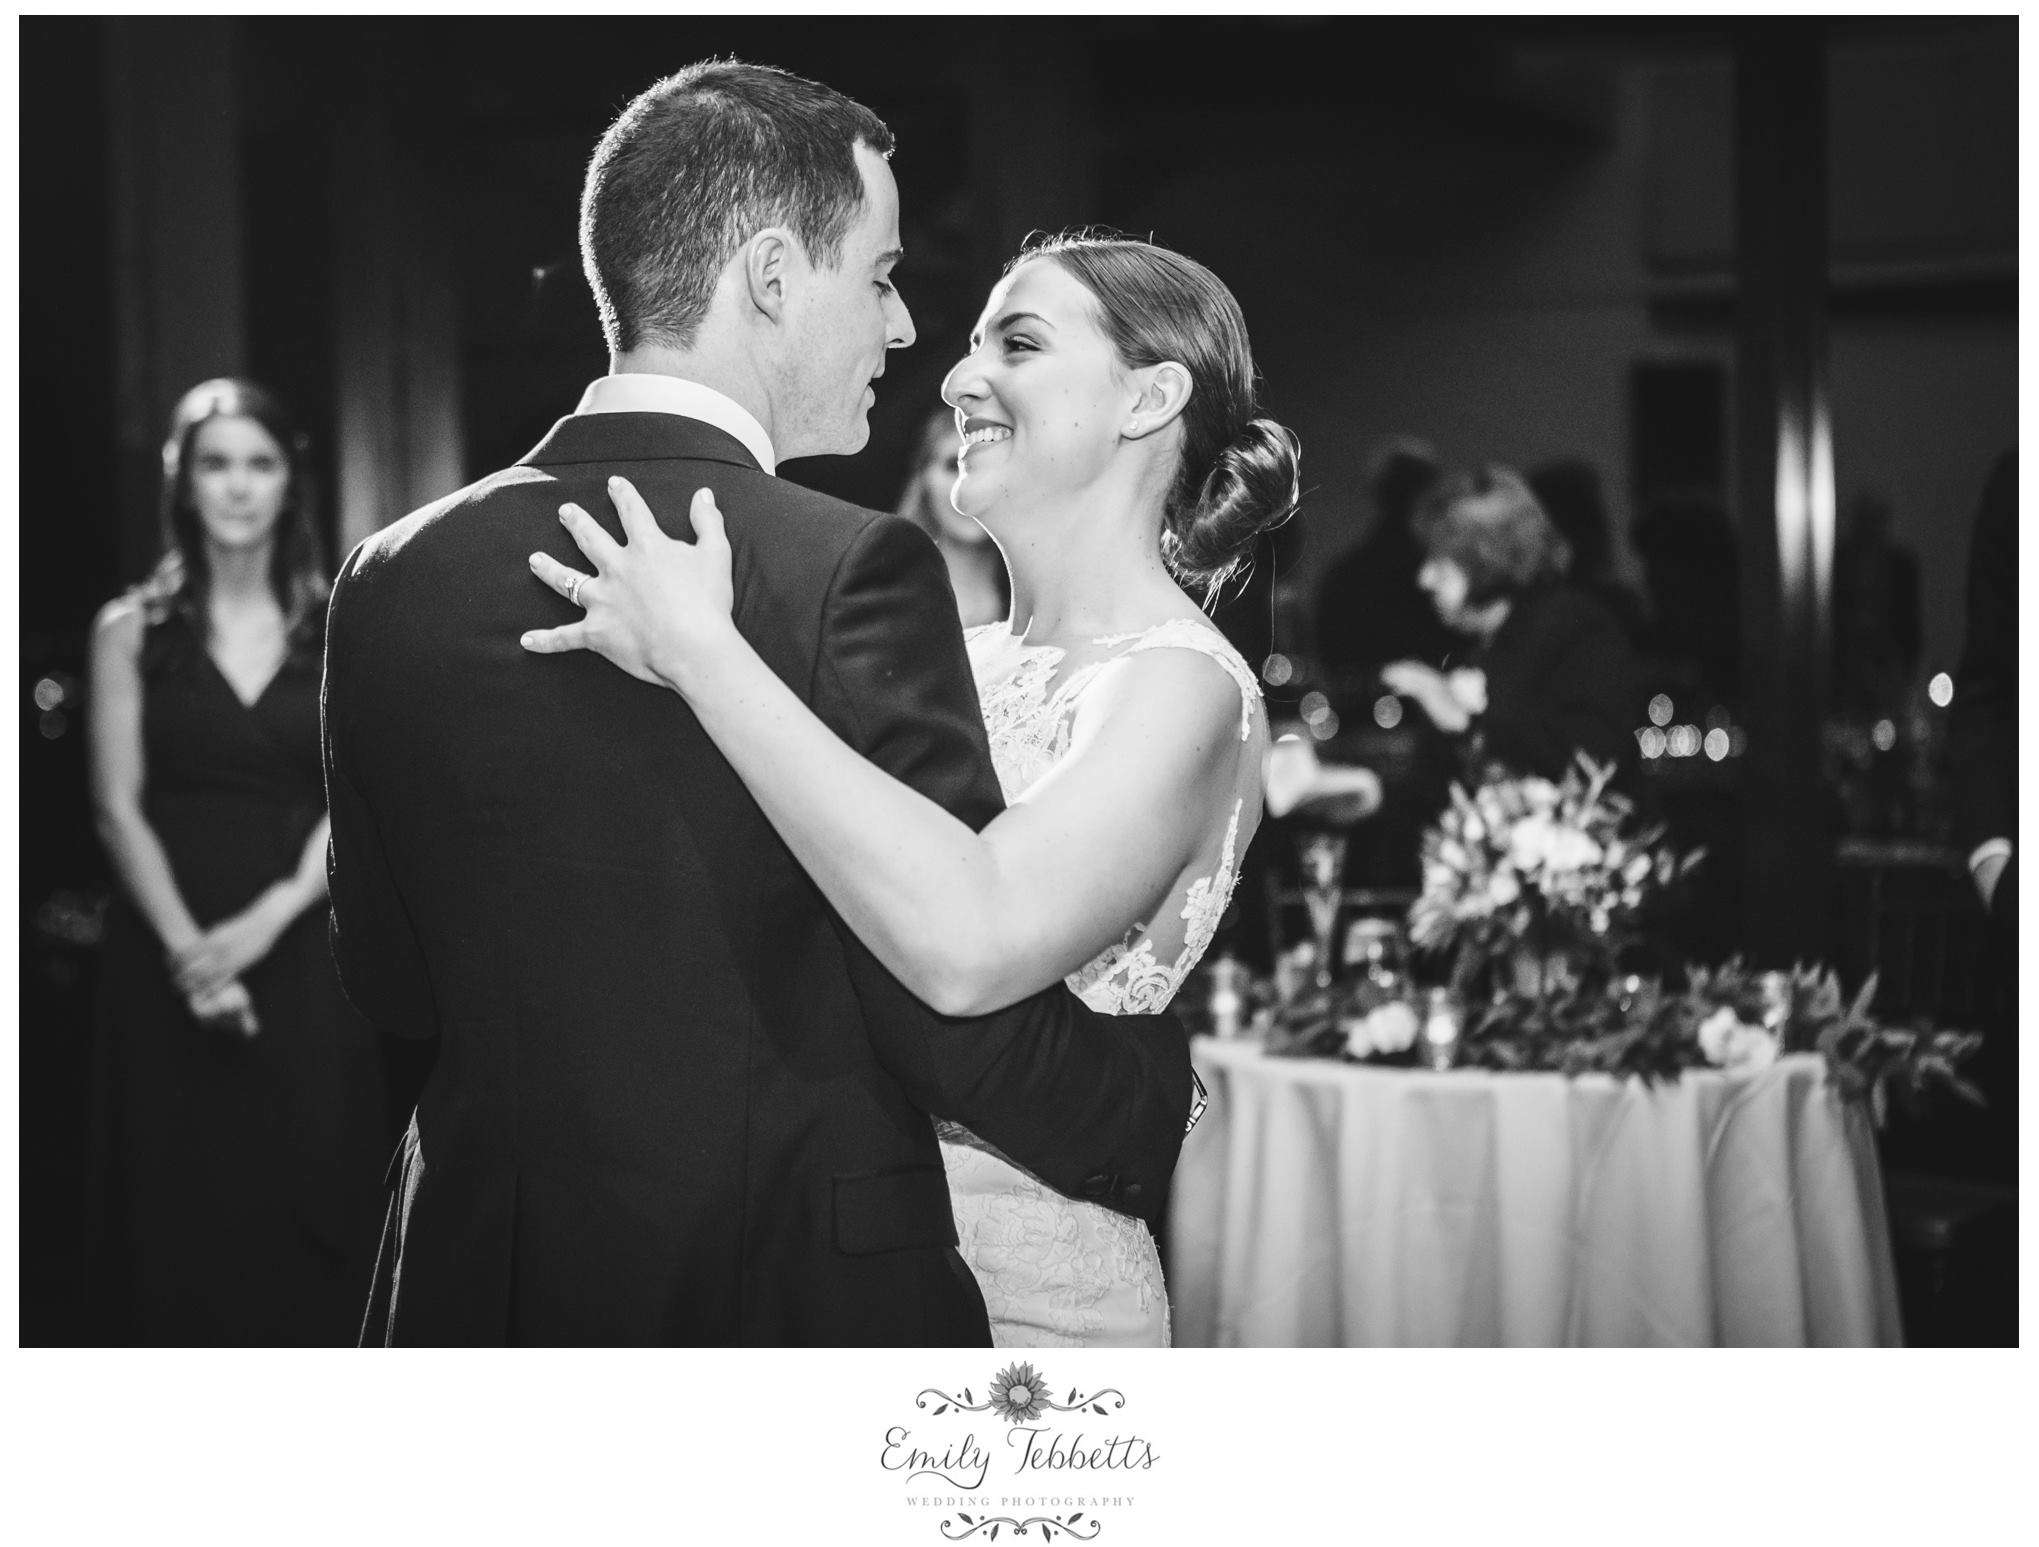 Boston, MA - Emily Tebbetts Wedding Photography 11.jpg